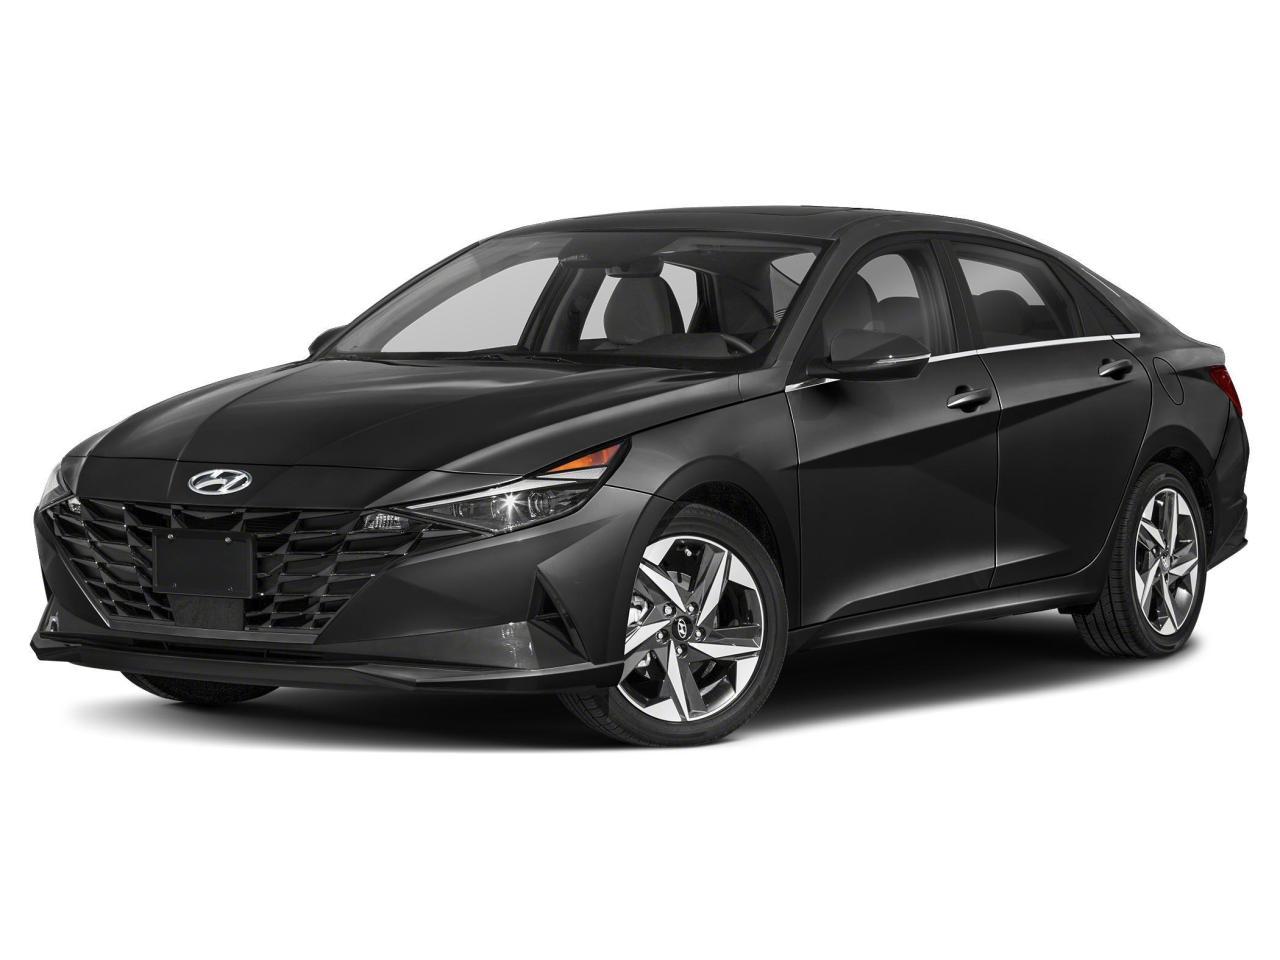 2022 Hyundai Elantra HYBRID PREFERRED NO OPTIONS